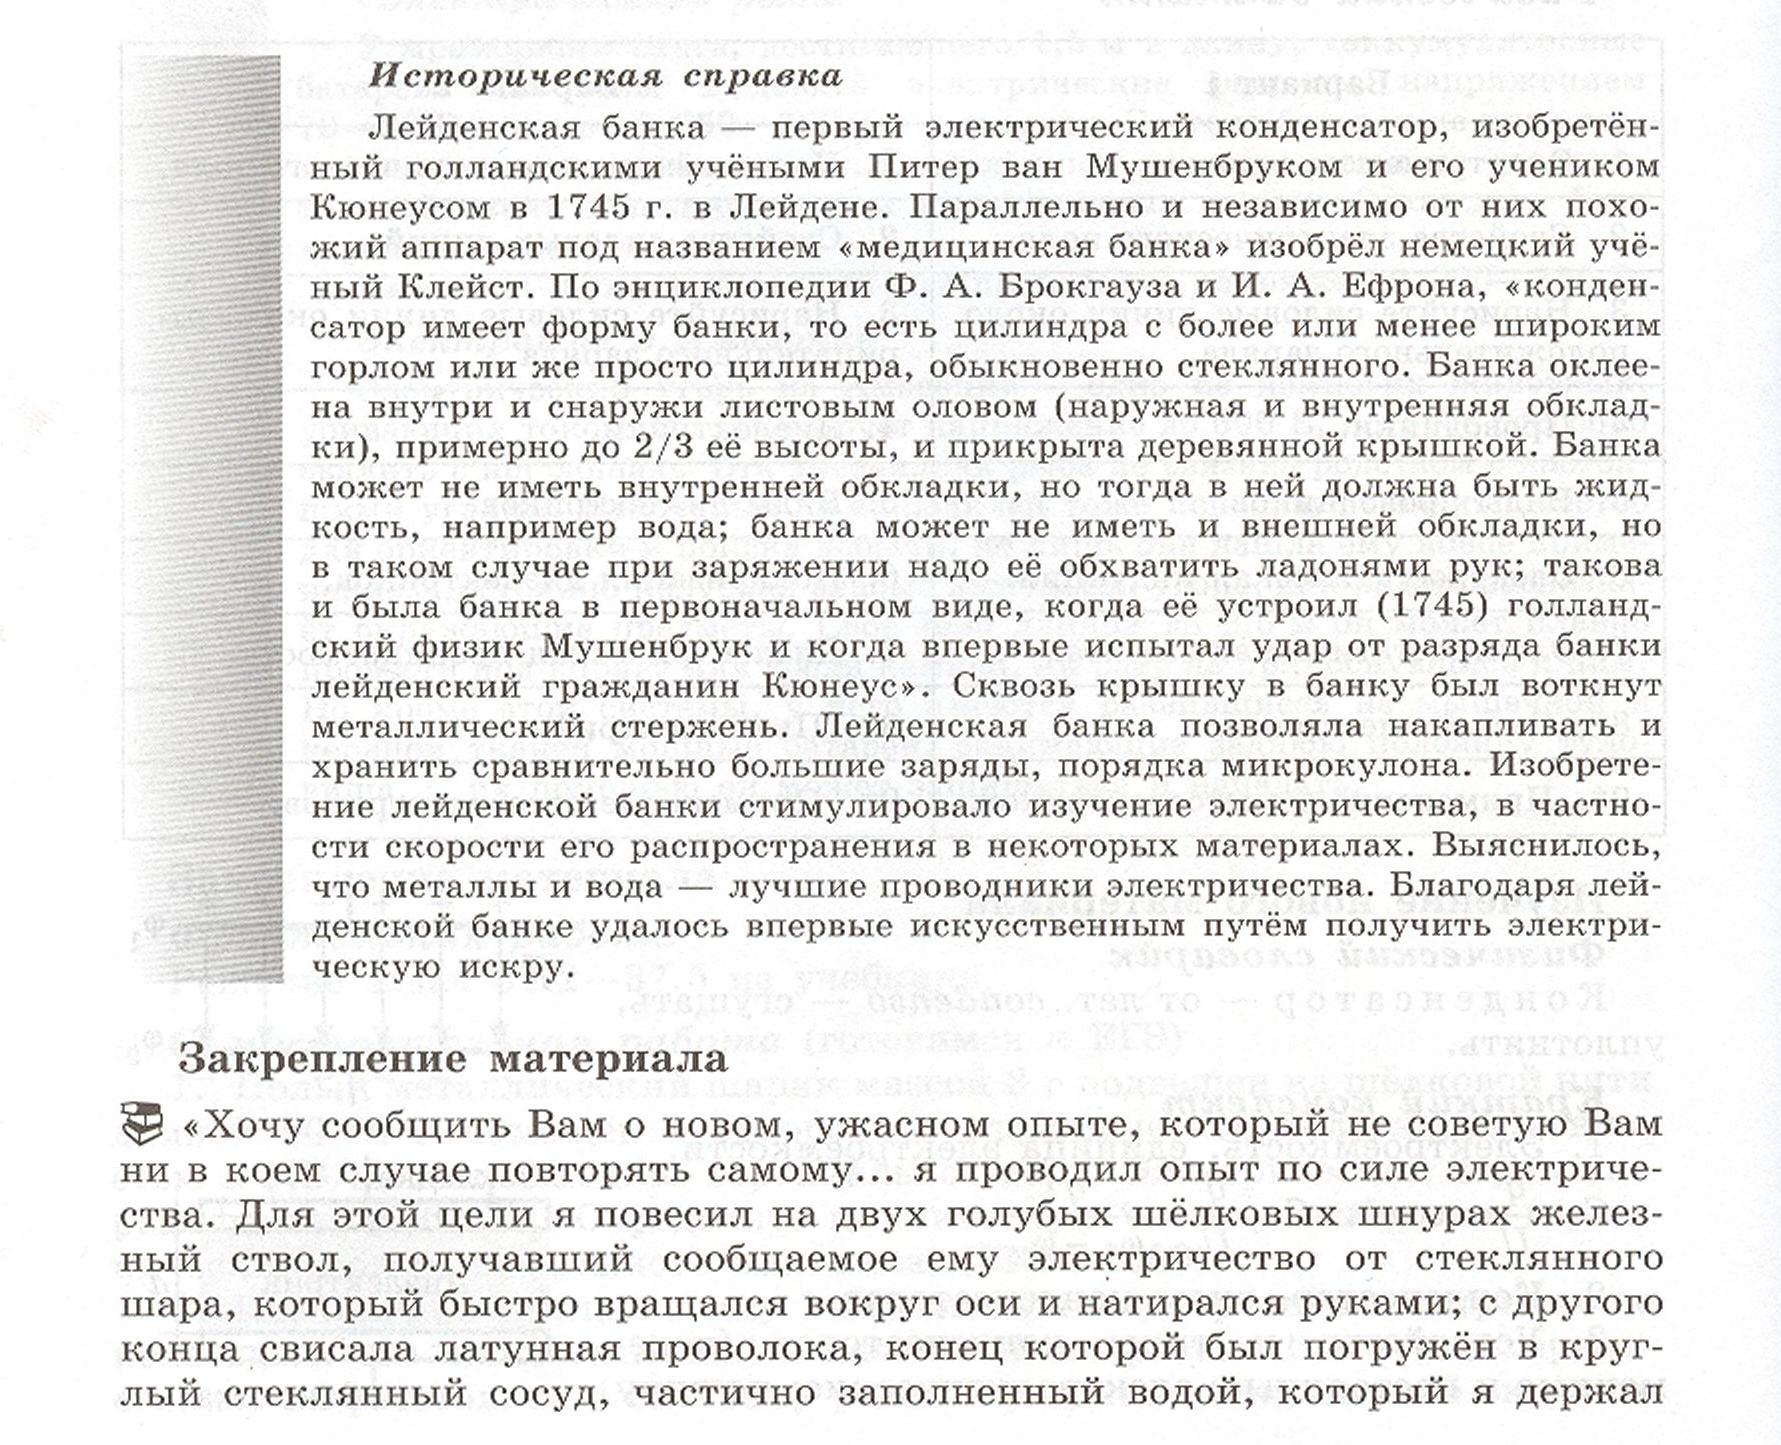 E:\Documents and Settings\Ученик\Local Settings\Temporary Internet Files\Content.Word\скан - 0001.jpg